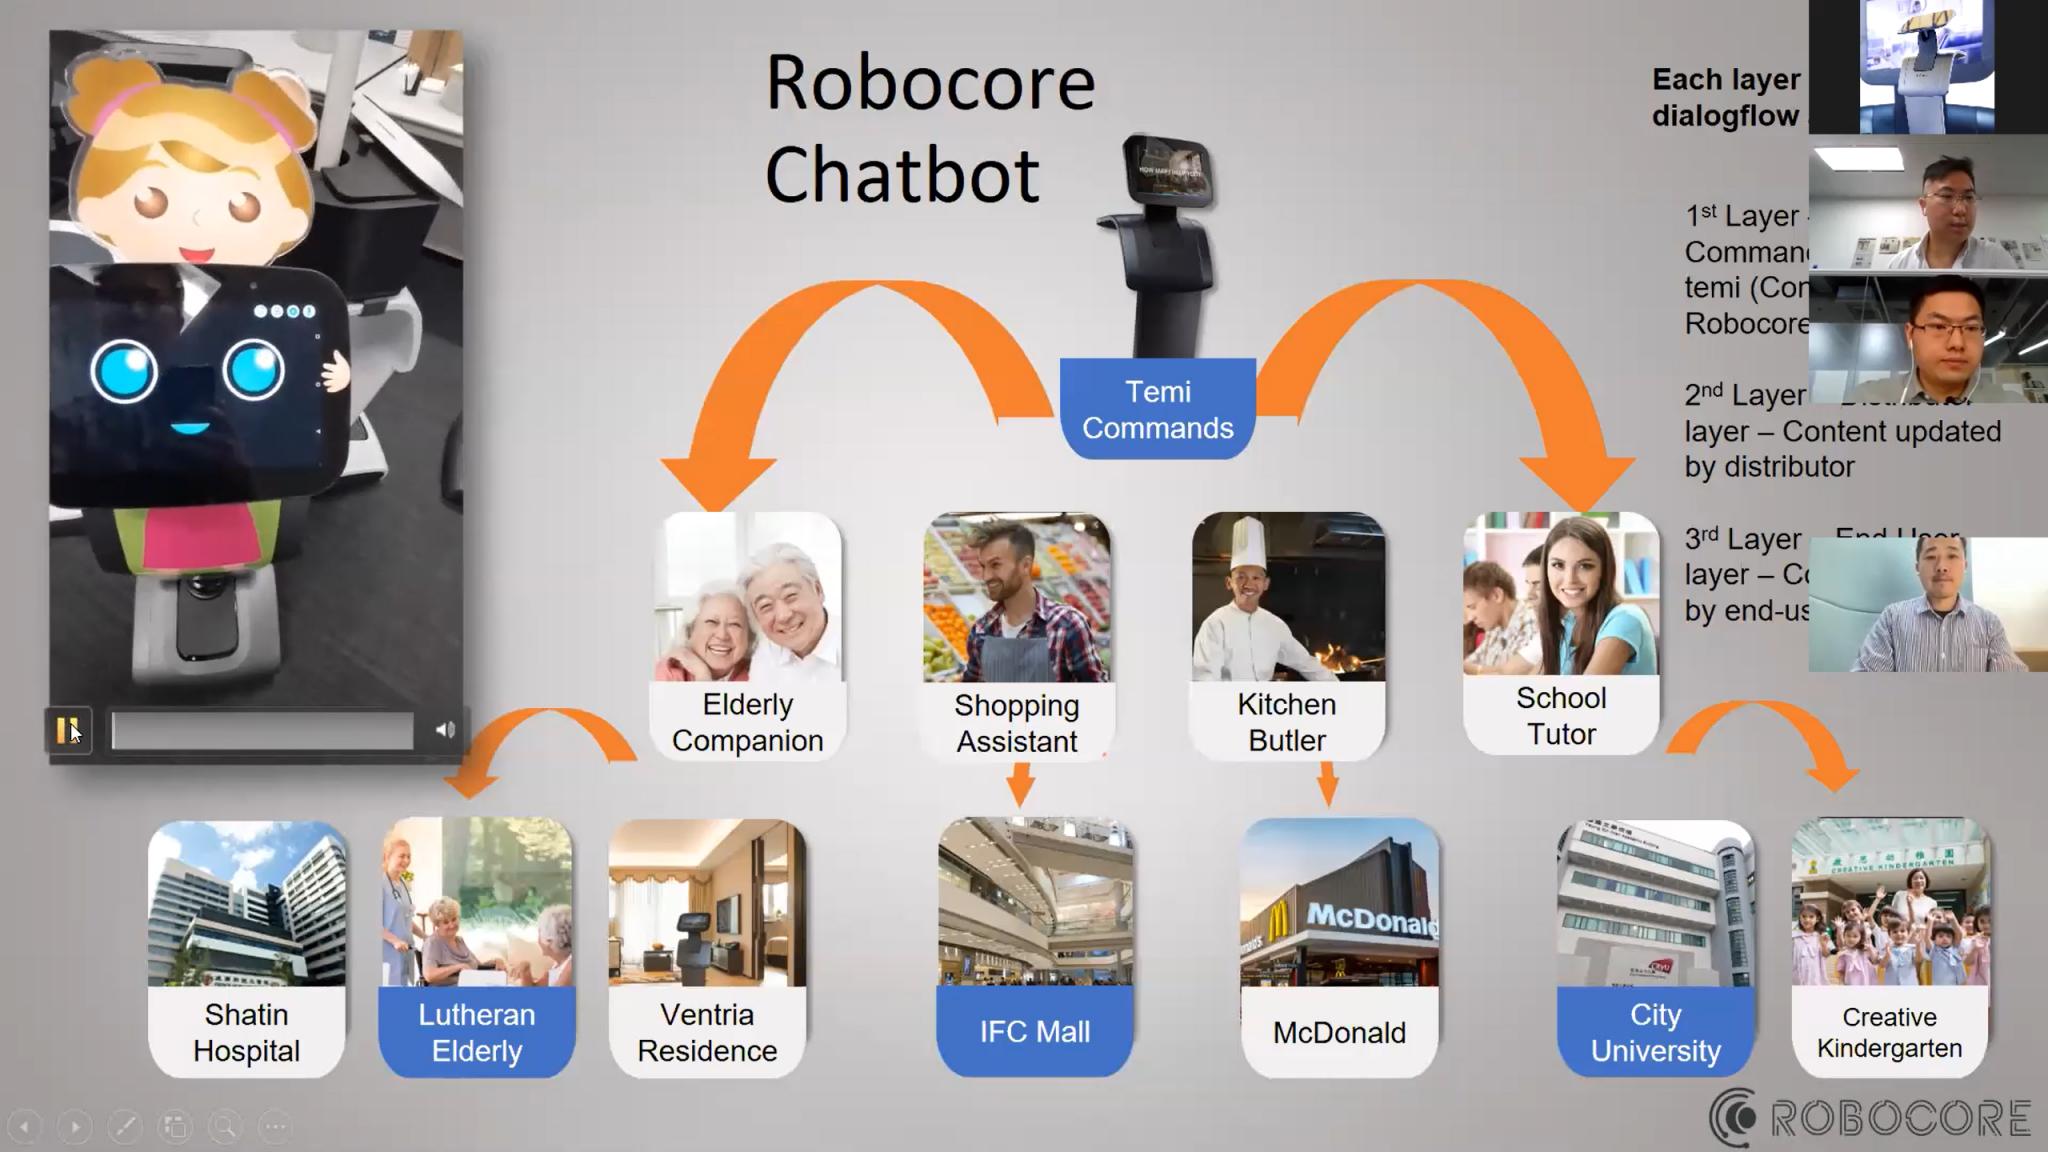 temi机器人在线研讨会 23个国家和地区共话发展机遇